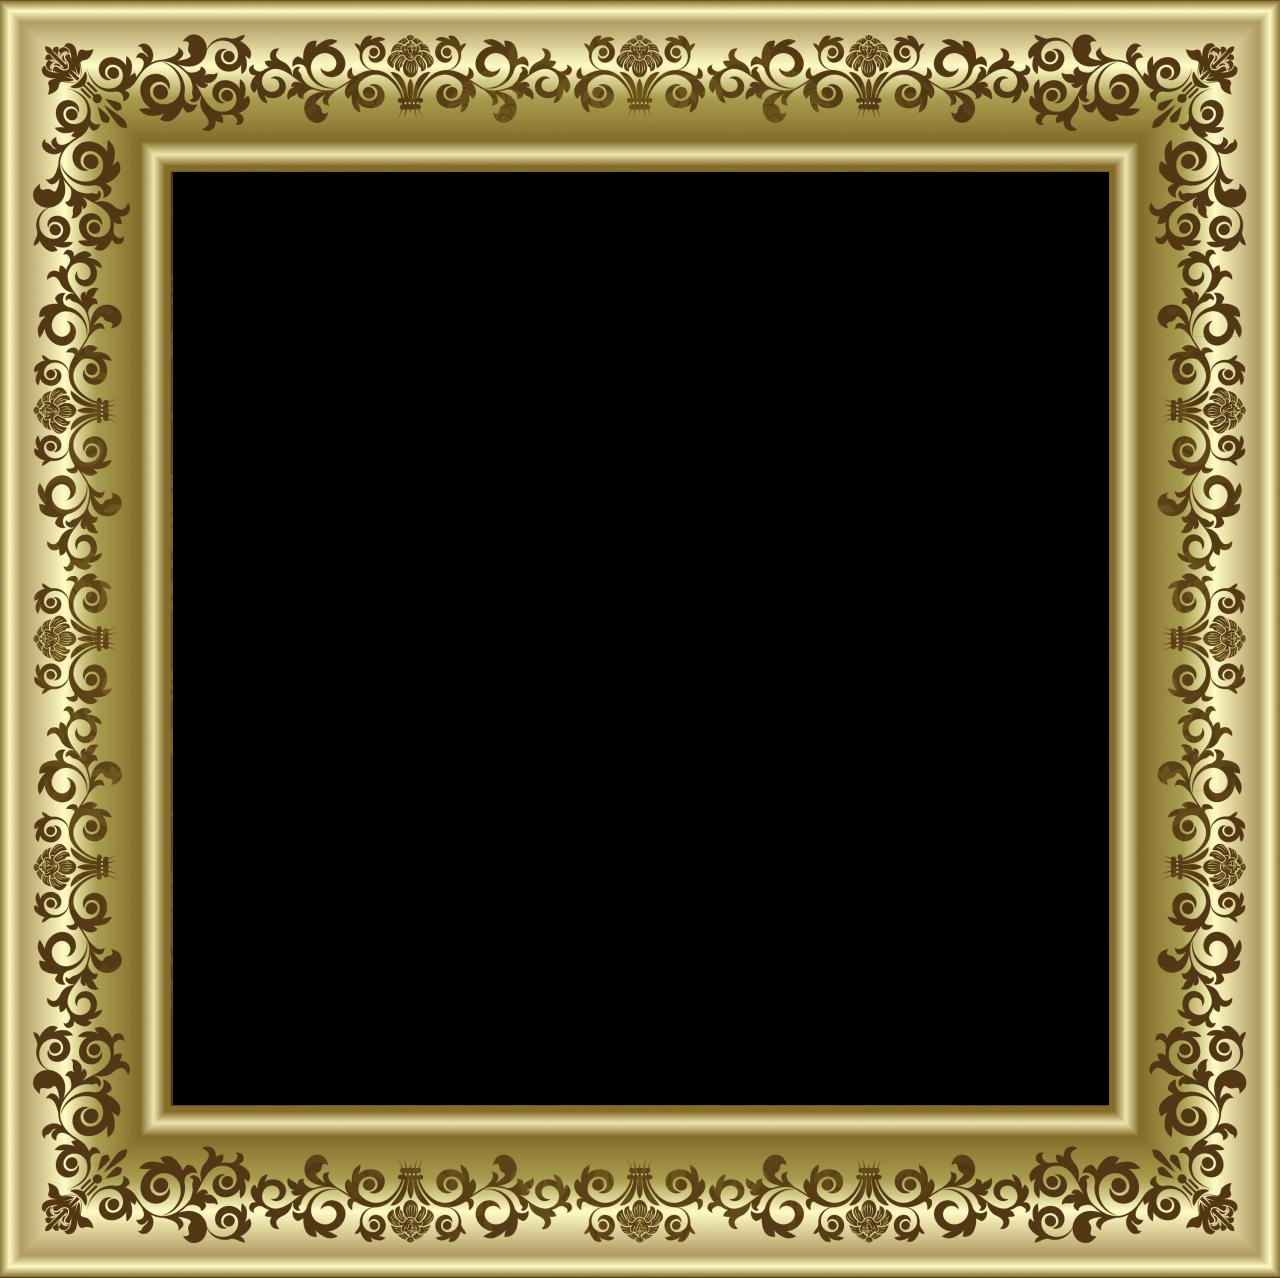 PNG Frames For Pictures Transparent Frames For Pictures.PNG Images.